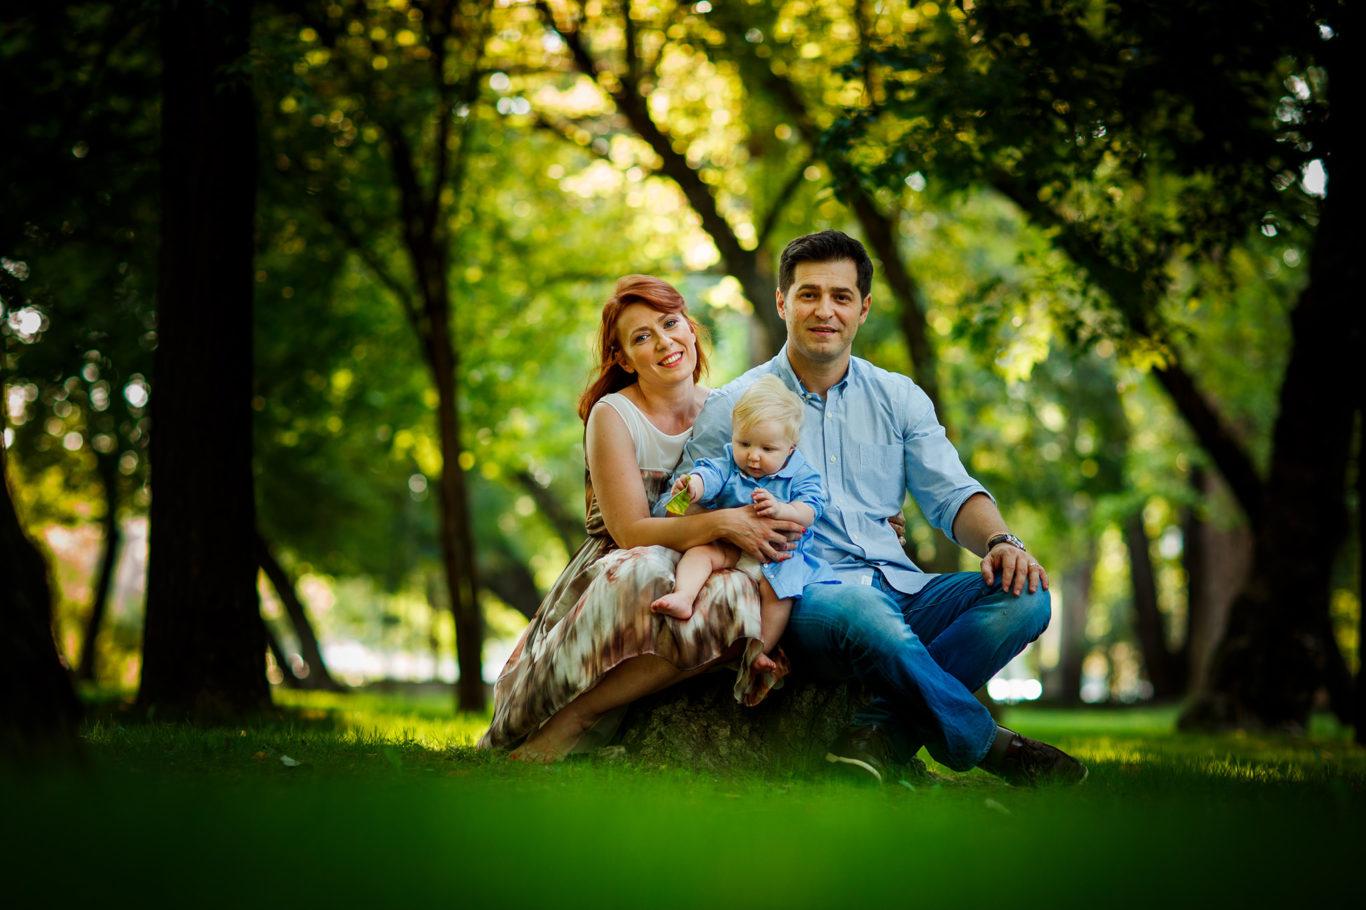 0077-fotografie-familie-ingrid-geta-mihai-ciprian-dumitrescu-cd2_4805